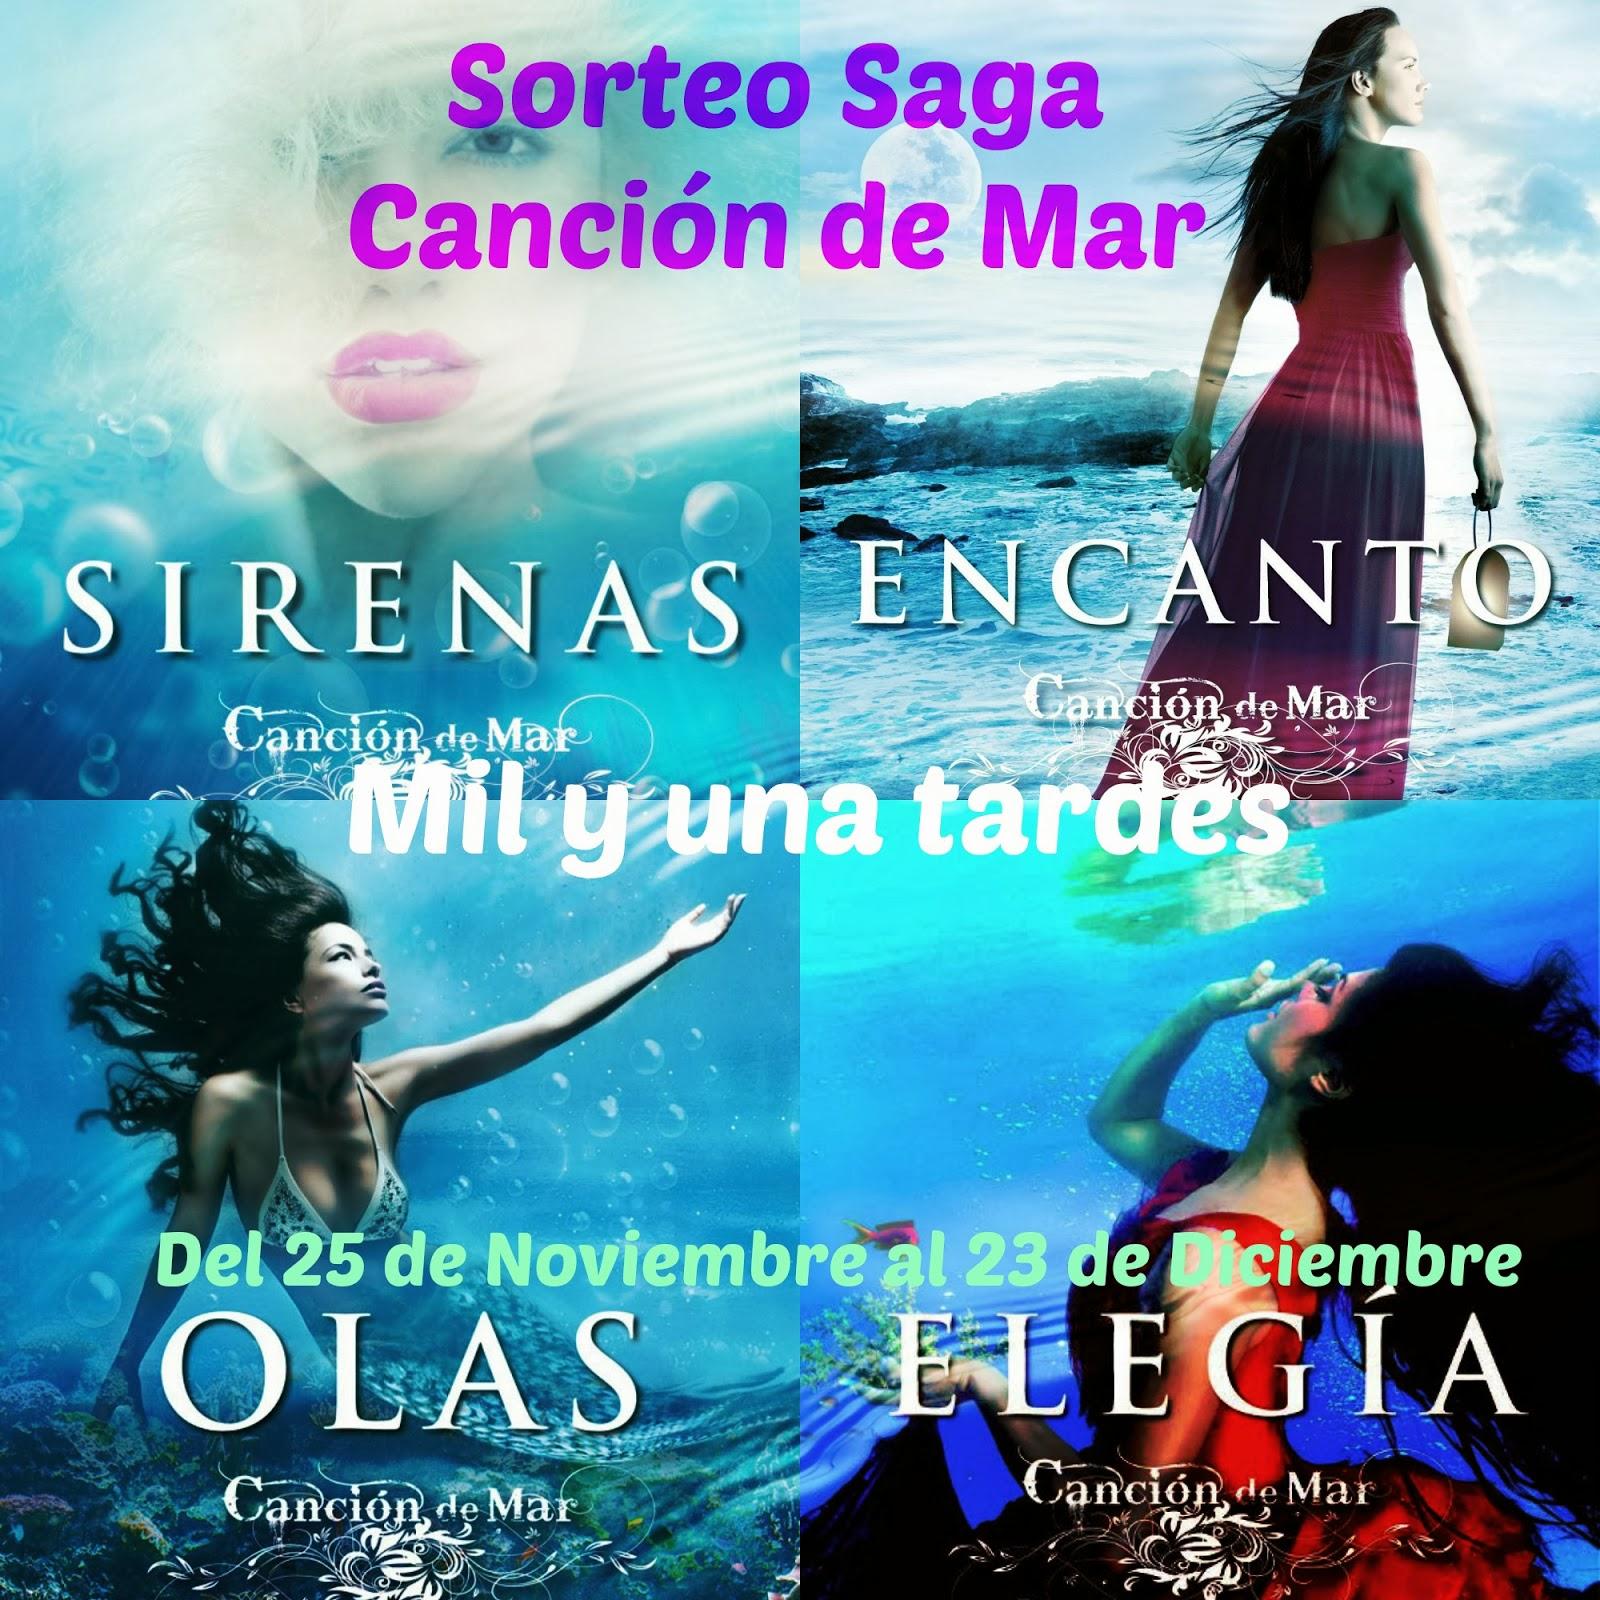 http://milyunatardes.blogspot.com.es/2013/11/sorteo-en-el-blog-gana-la-saga-cancion.html